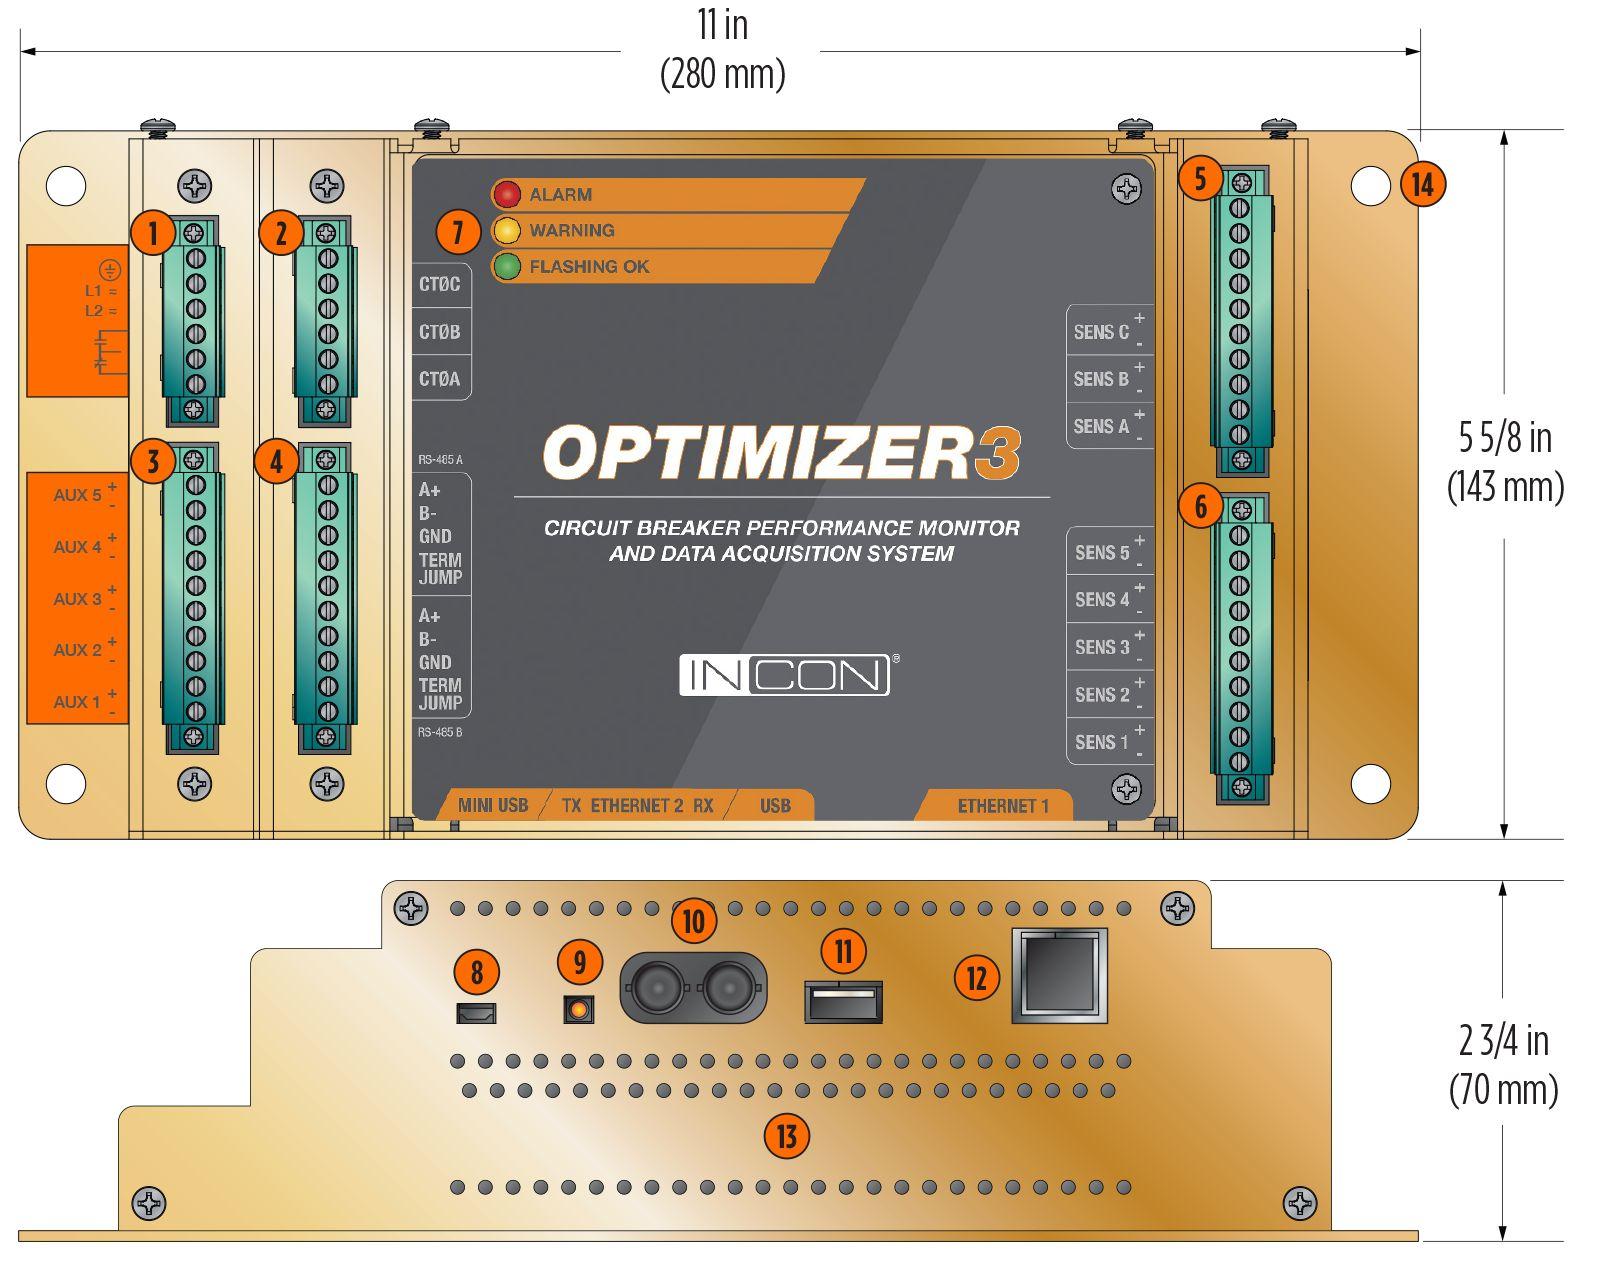 Optimizer3 Dims Comps.psd